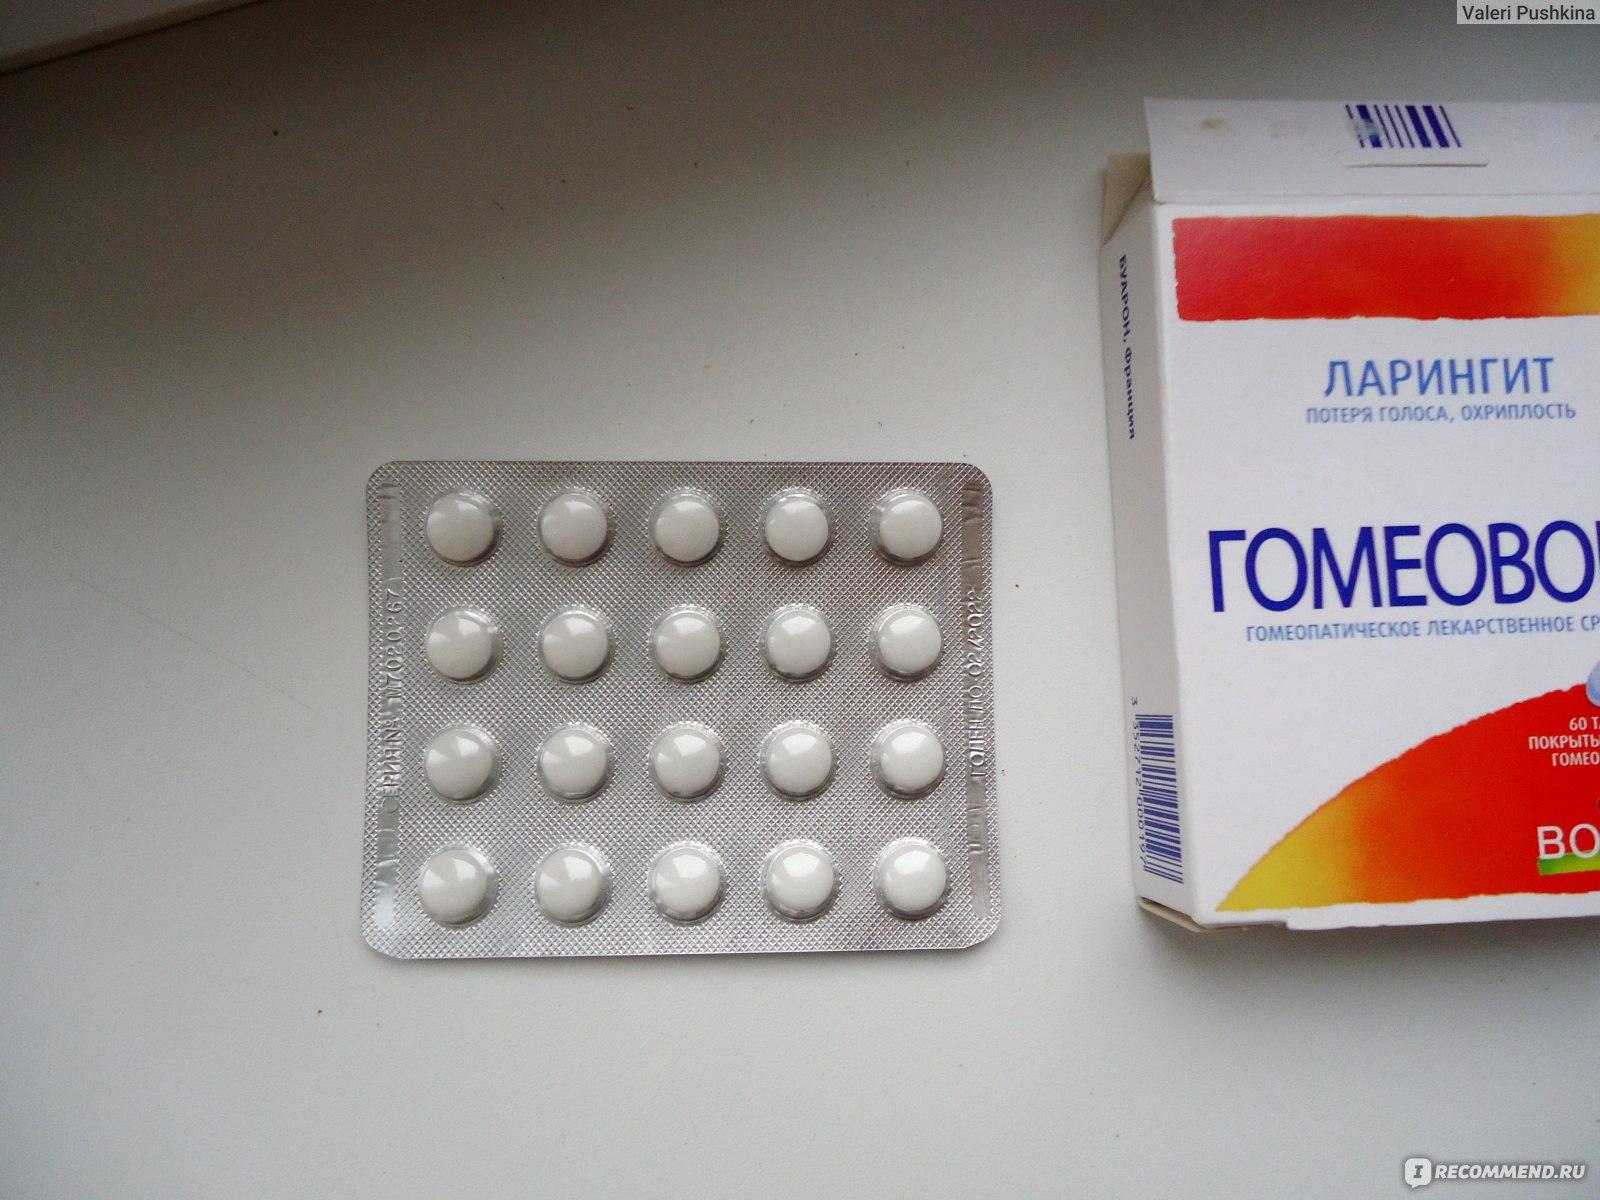 Drug Gomeovoks: instructions for use 55